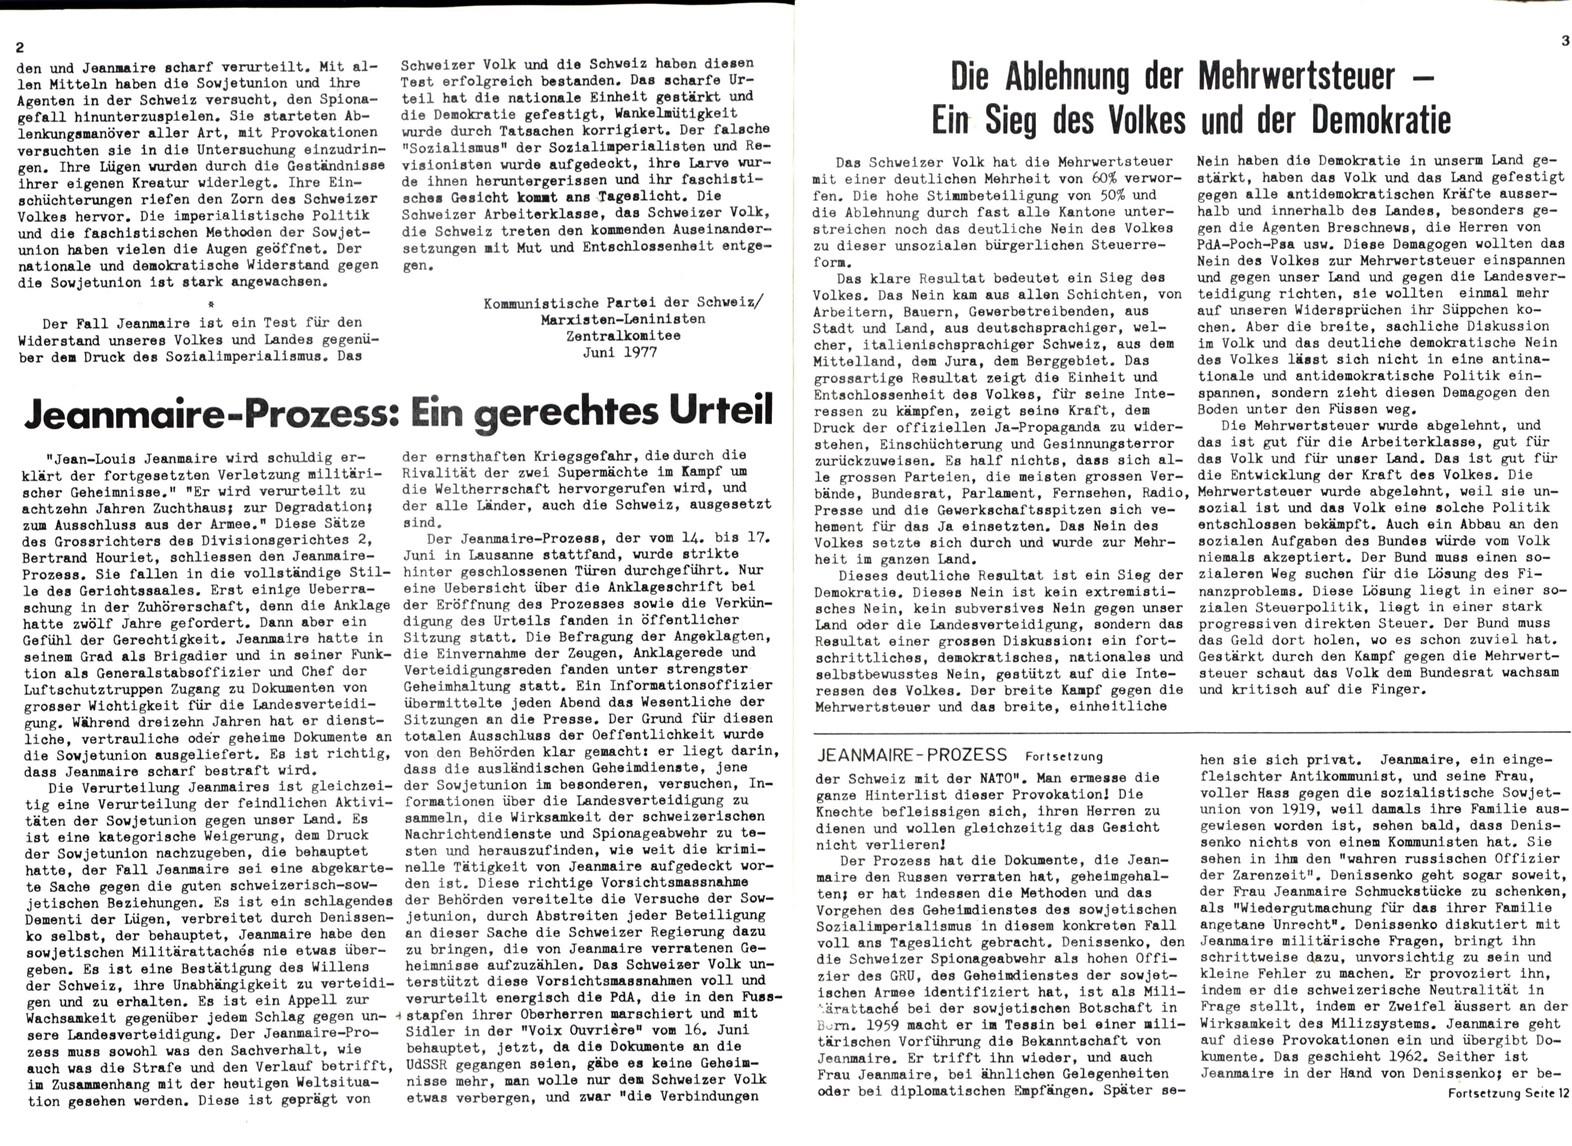 Schweiz_KPSML_Oktober_19770700_112_002